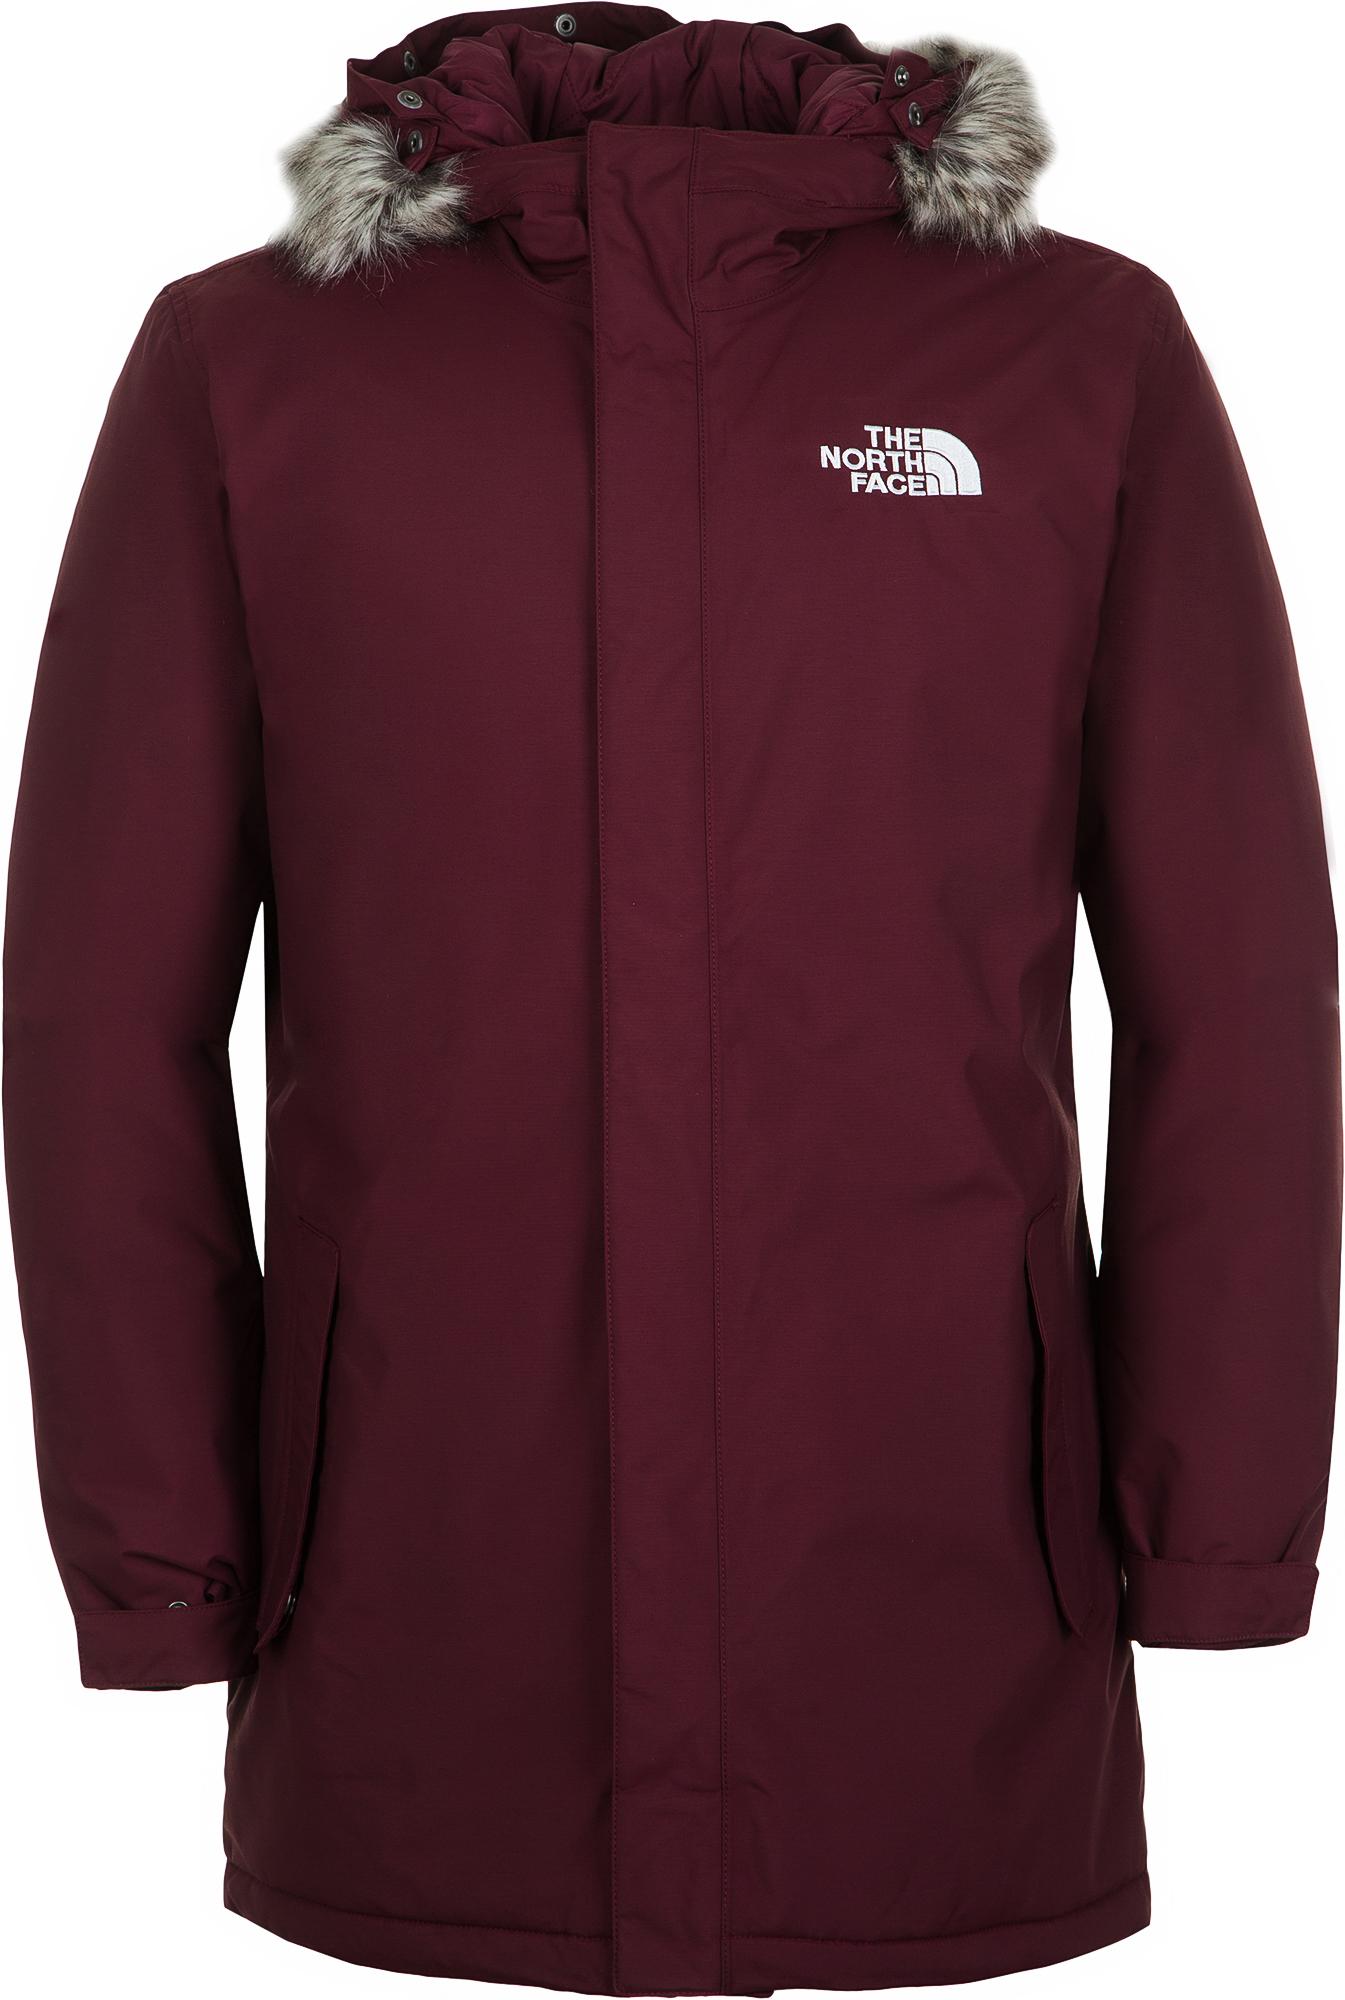 The North Face Куртка утепленная мужская The North Face Zaneck, размер 52 цена